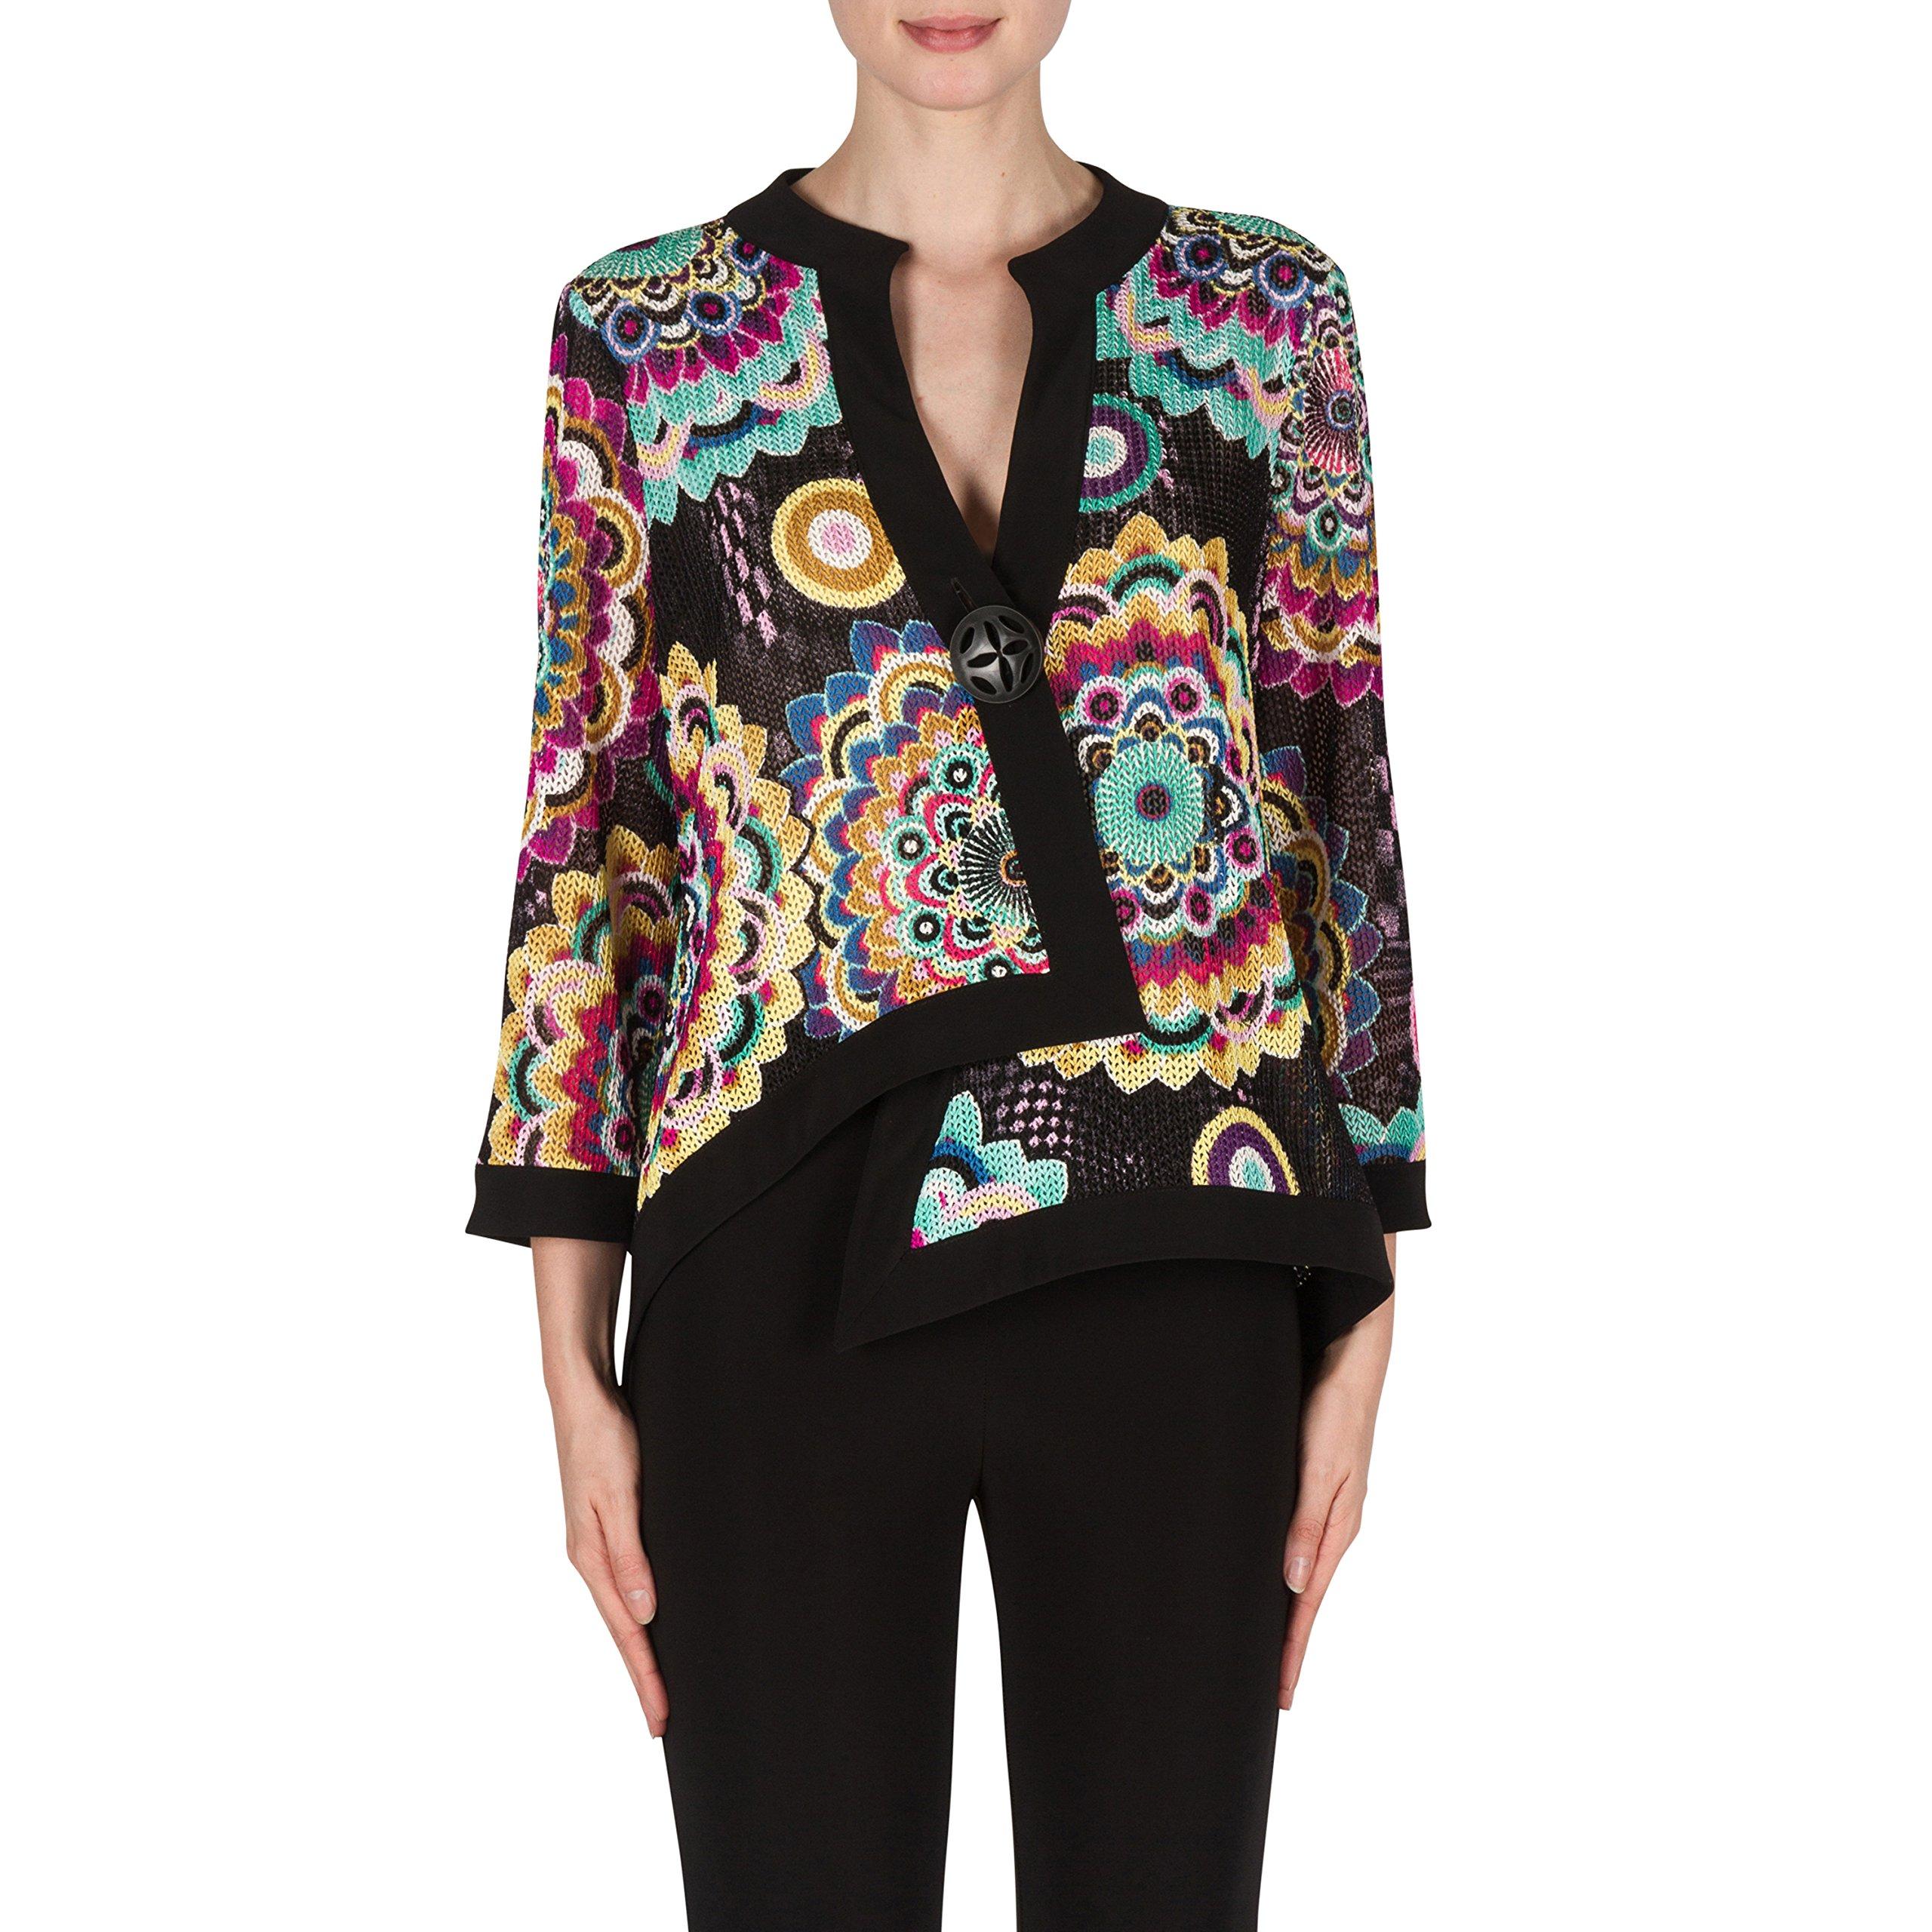 Joseph Ribkoff SPRING 2018 Jacket Style 181588